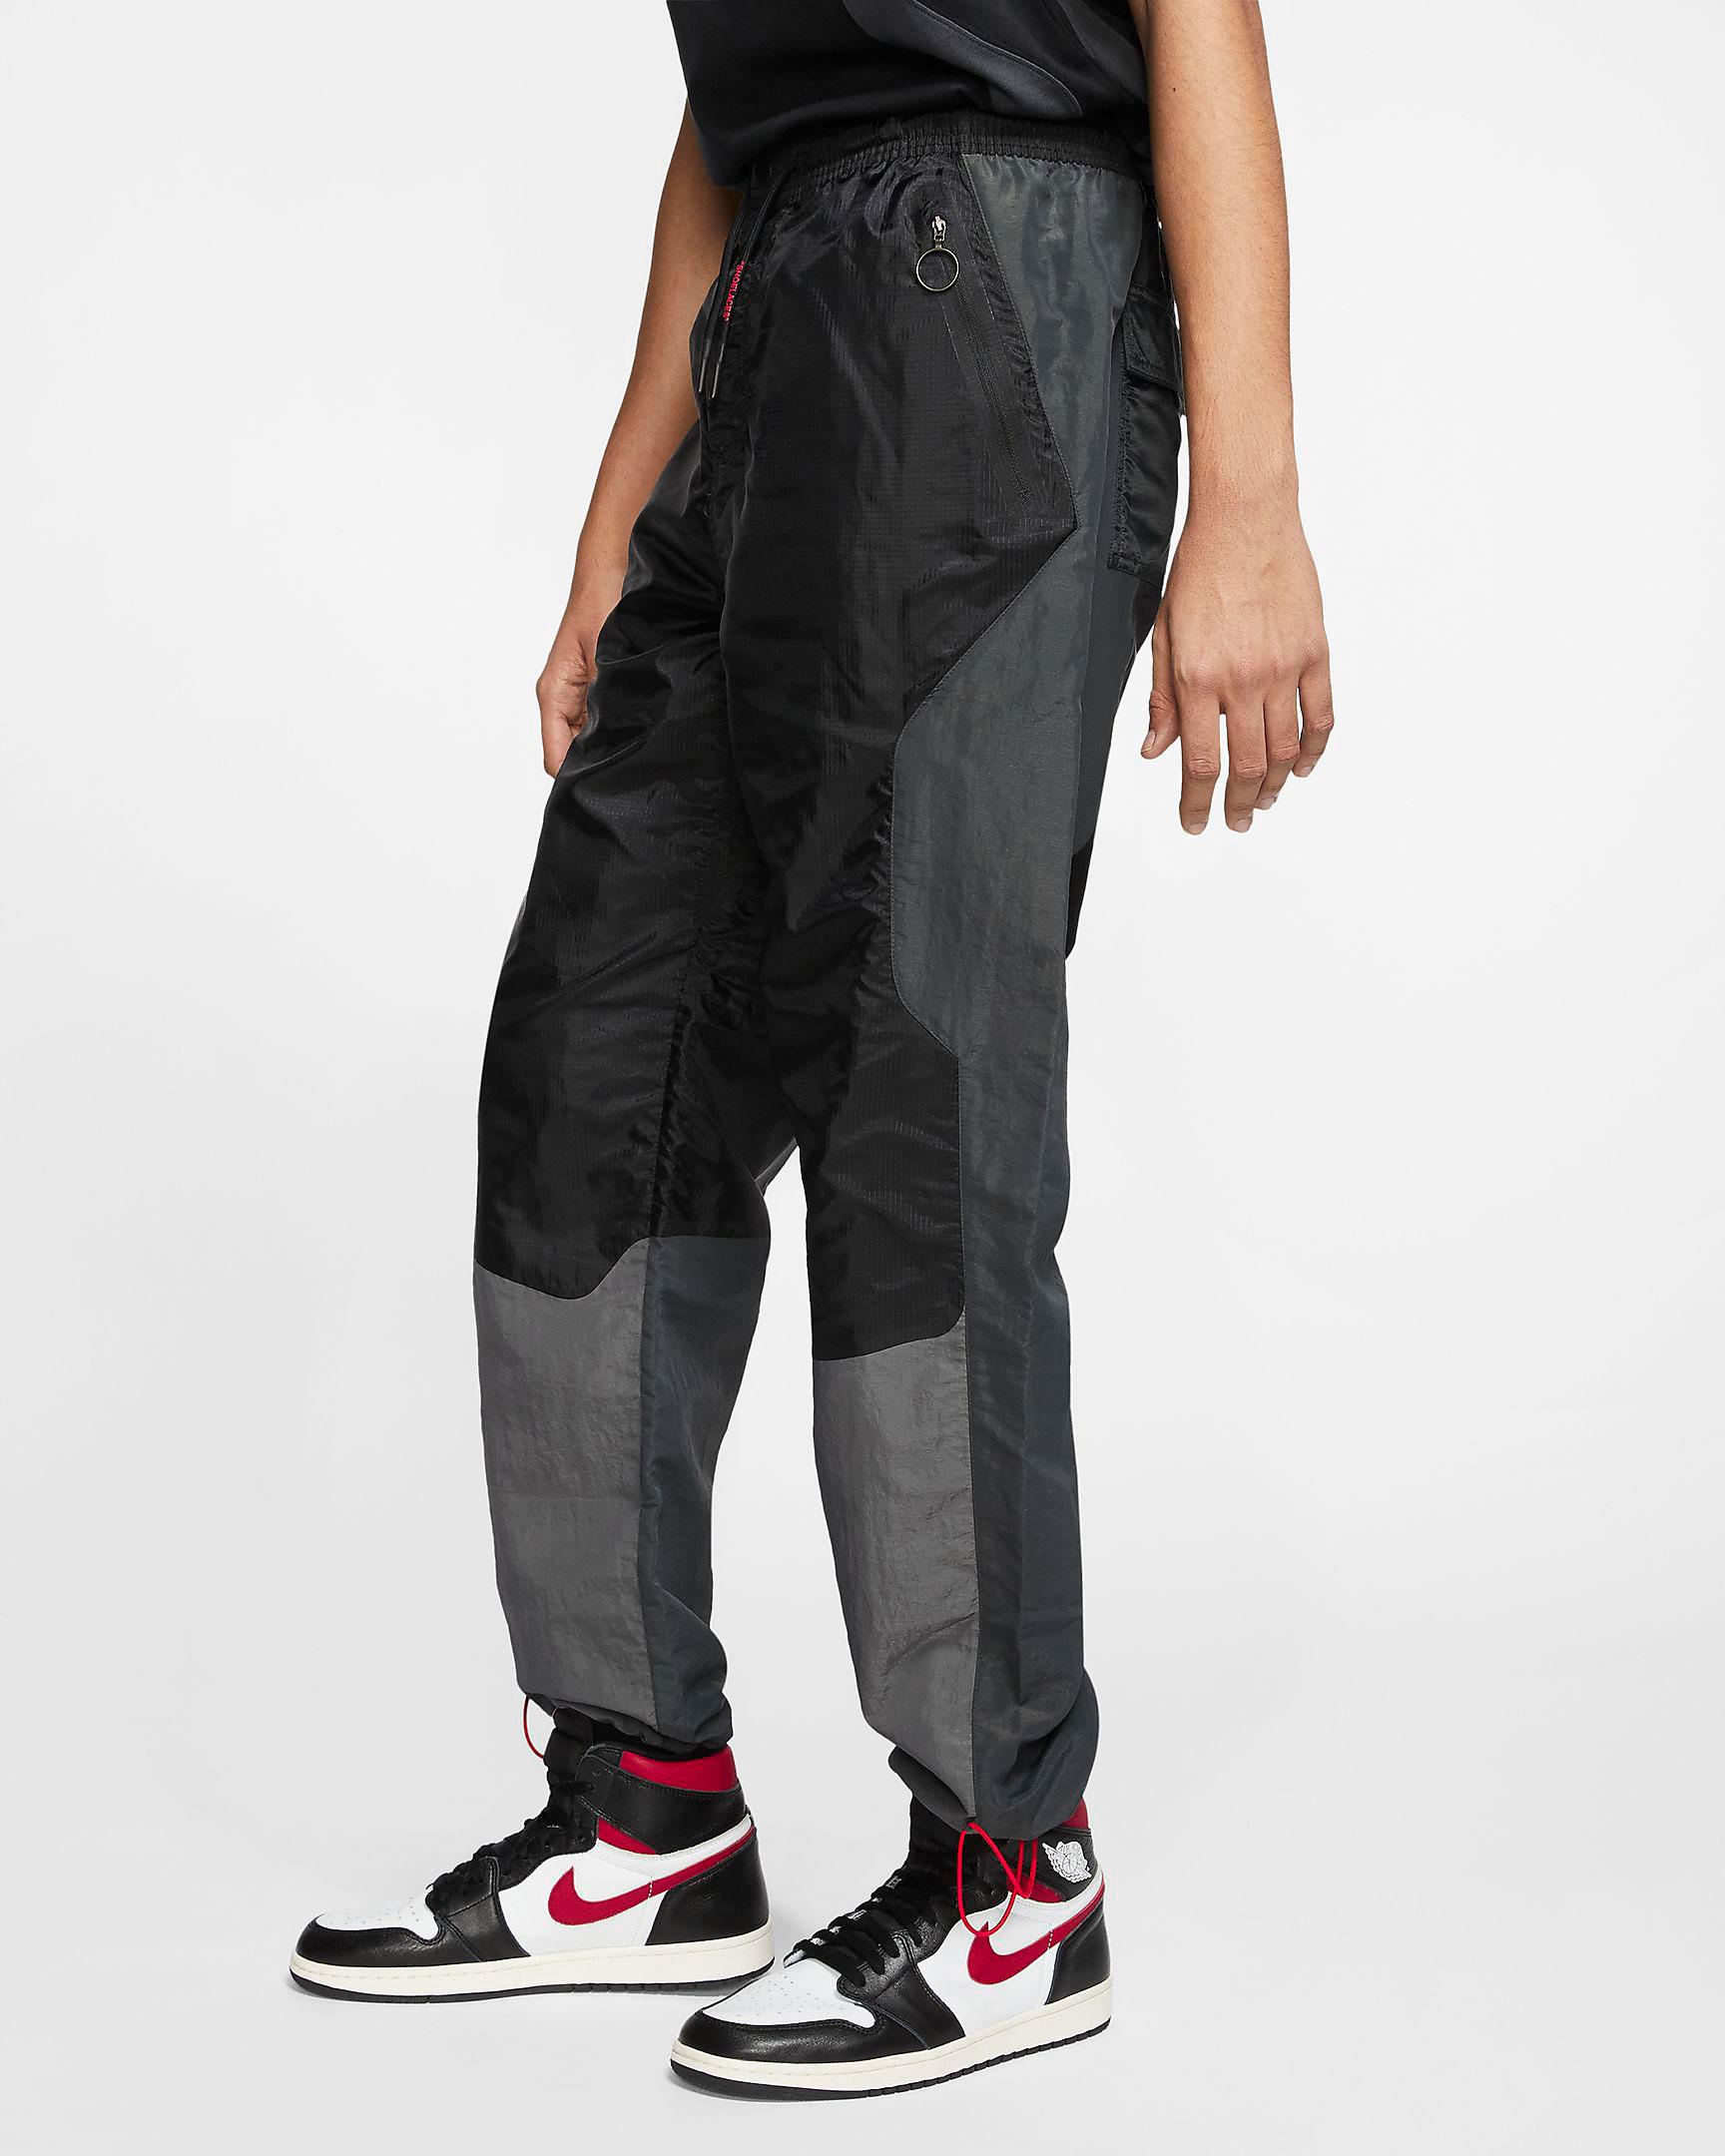 off-white-jordan-5-pants-1